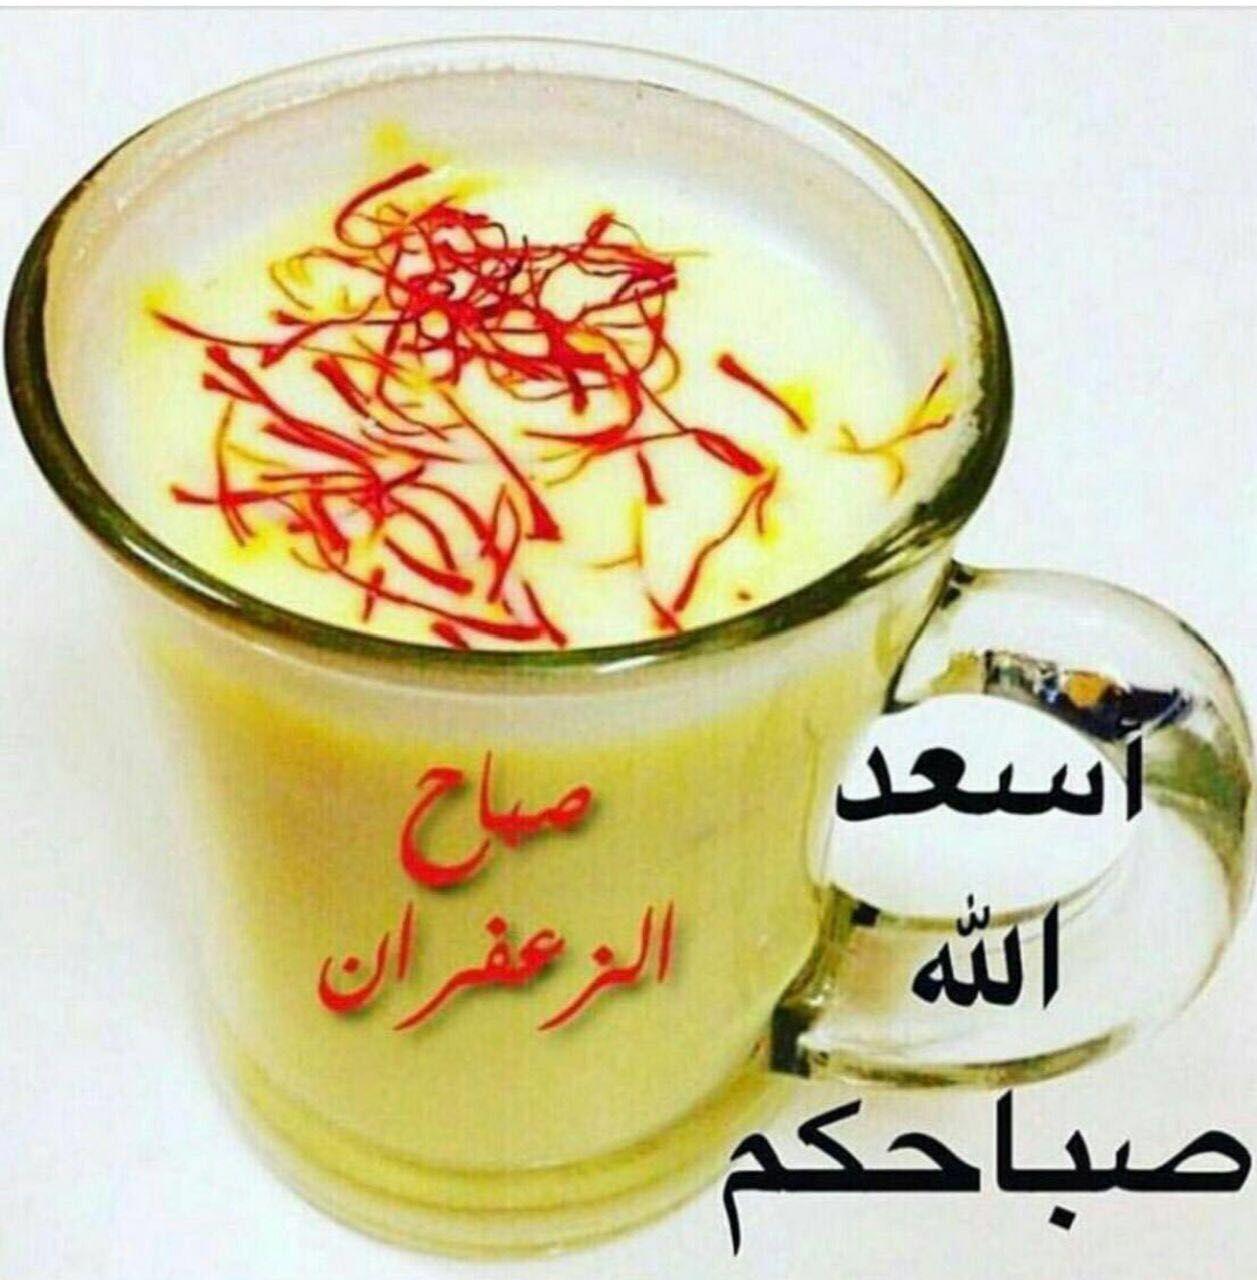 Pin By Ali علي On صباح الخير Good Morning Glassware Tableware Muslim Greeting